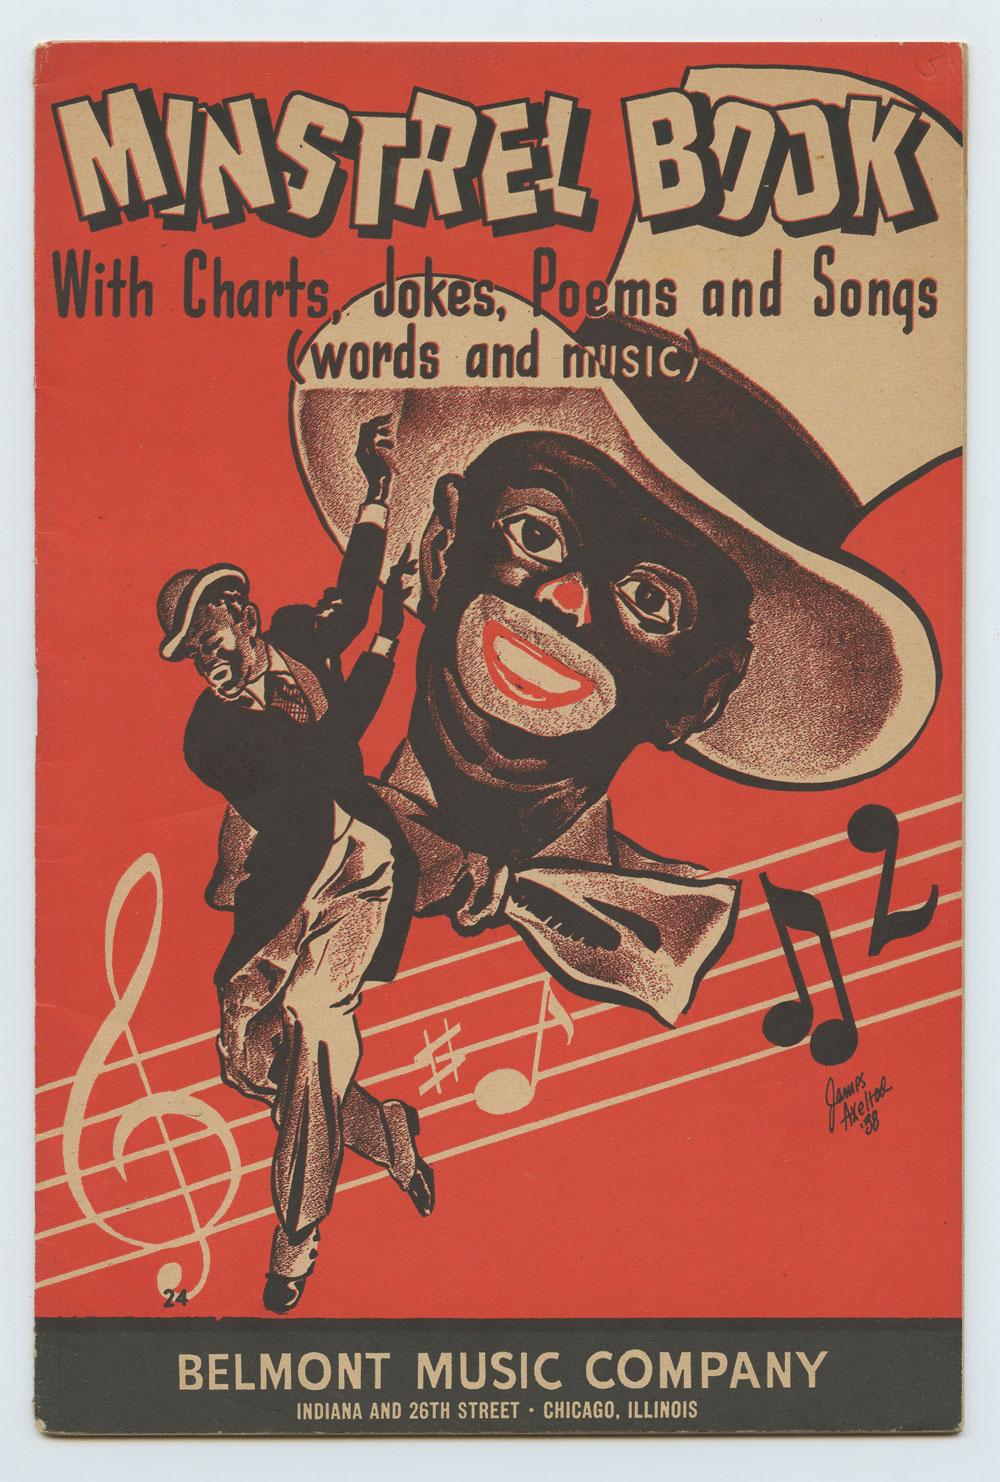 1938 Minstrel Book Belmont Music Company